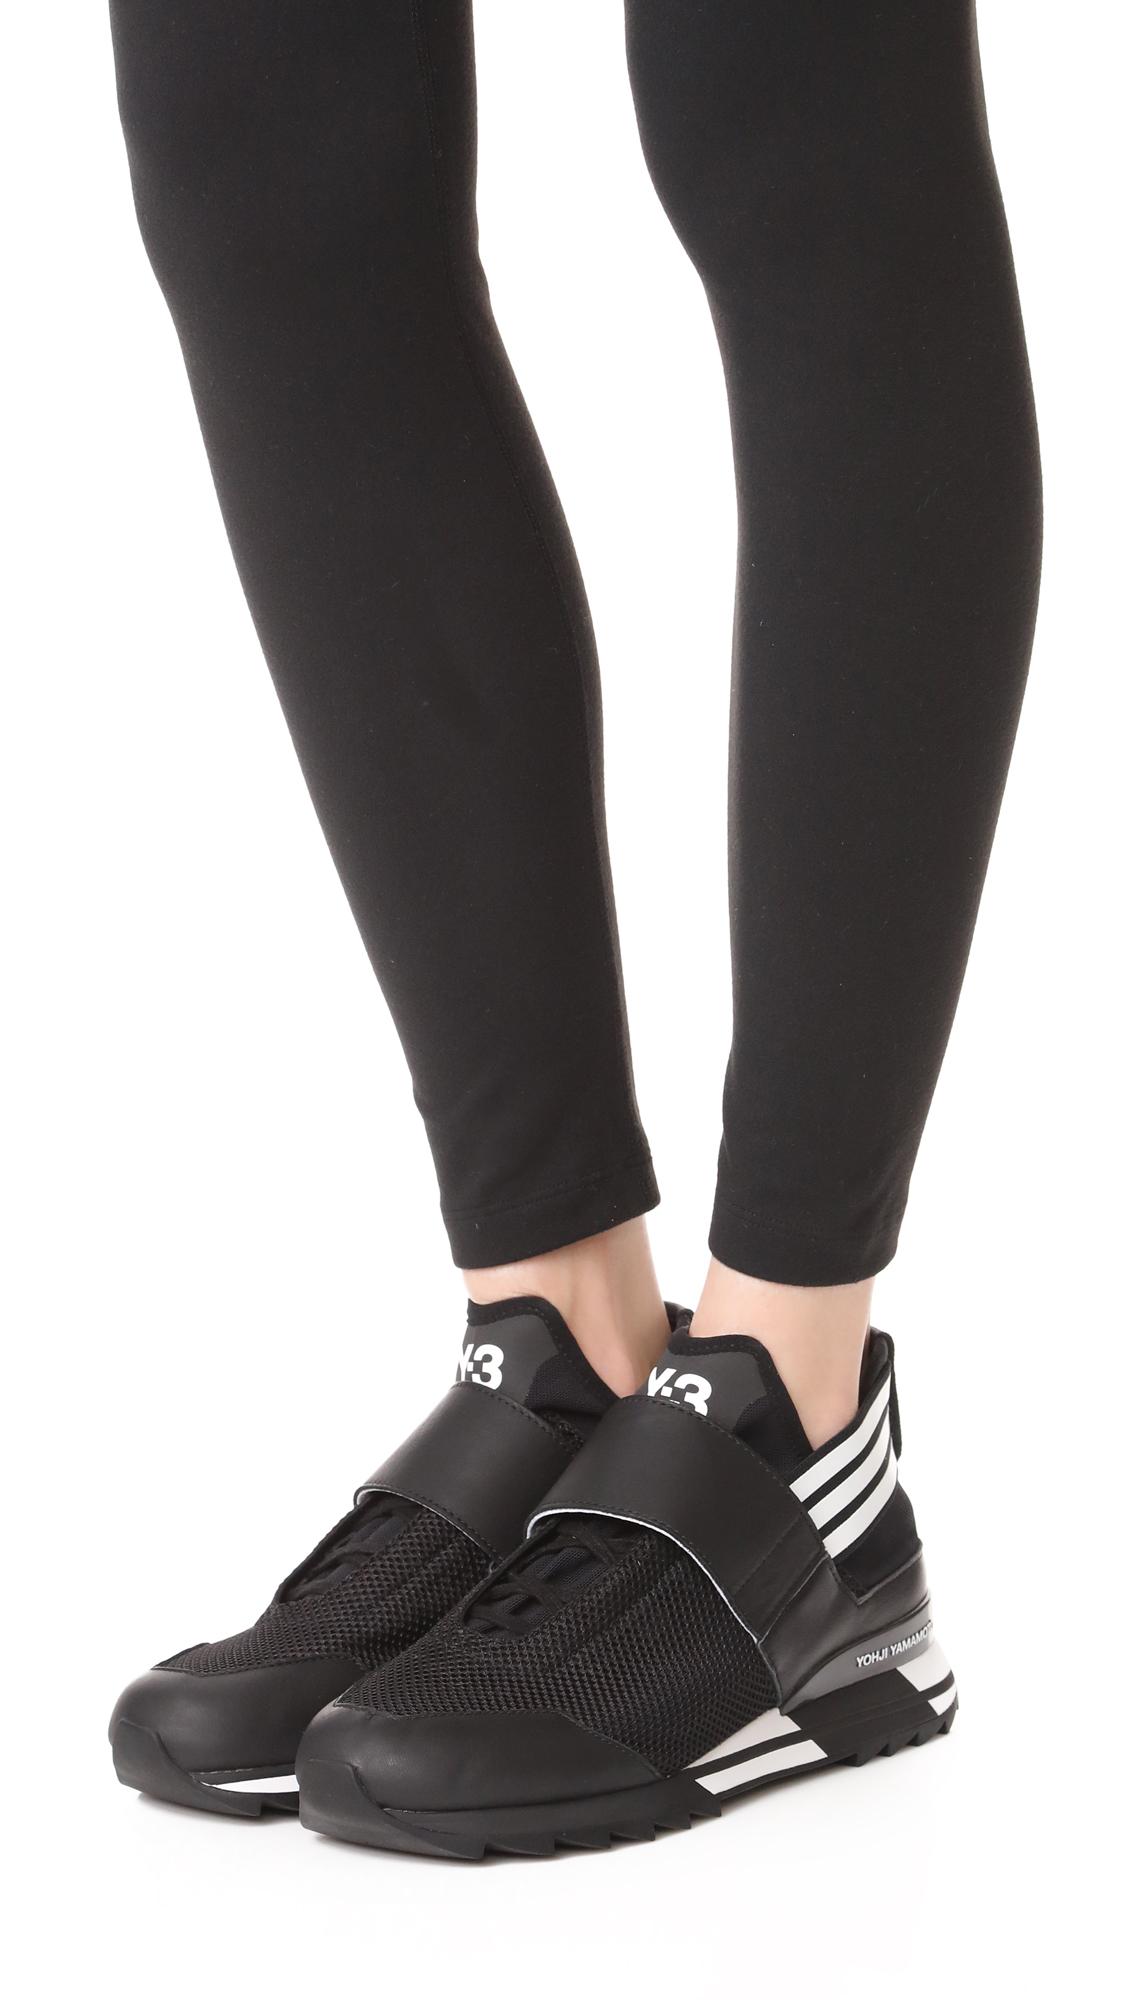 f833f14805d8 Y-3 Y-3 Atira Sneakers